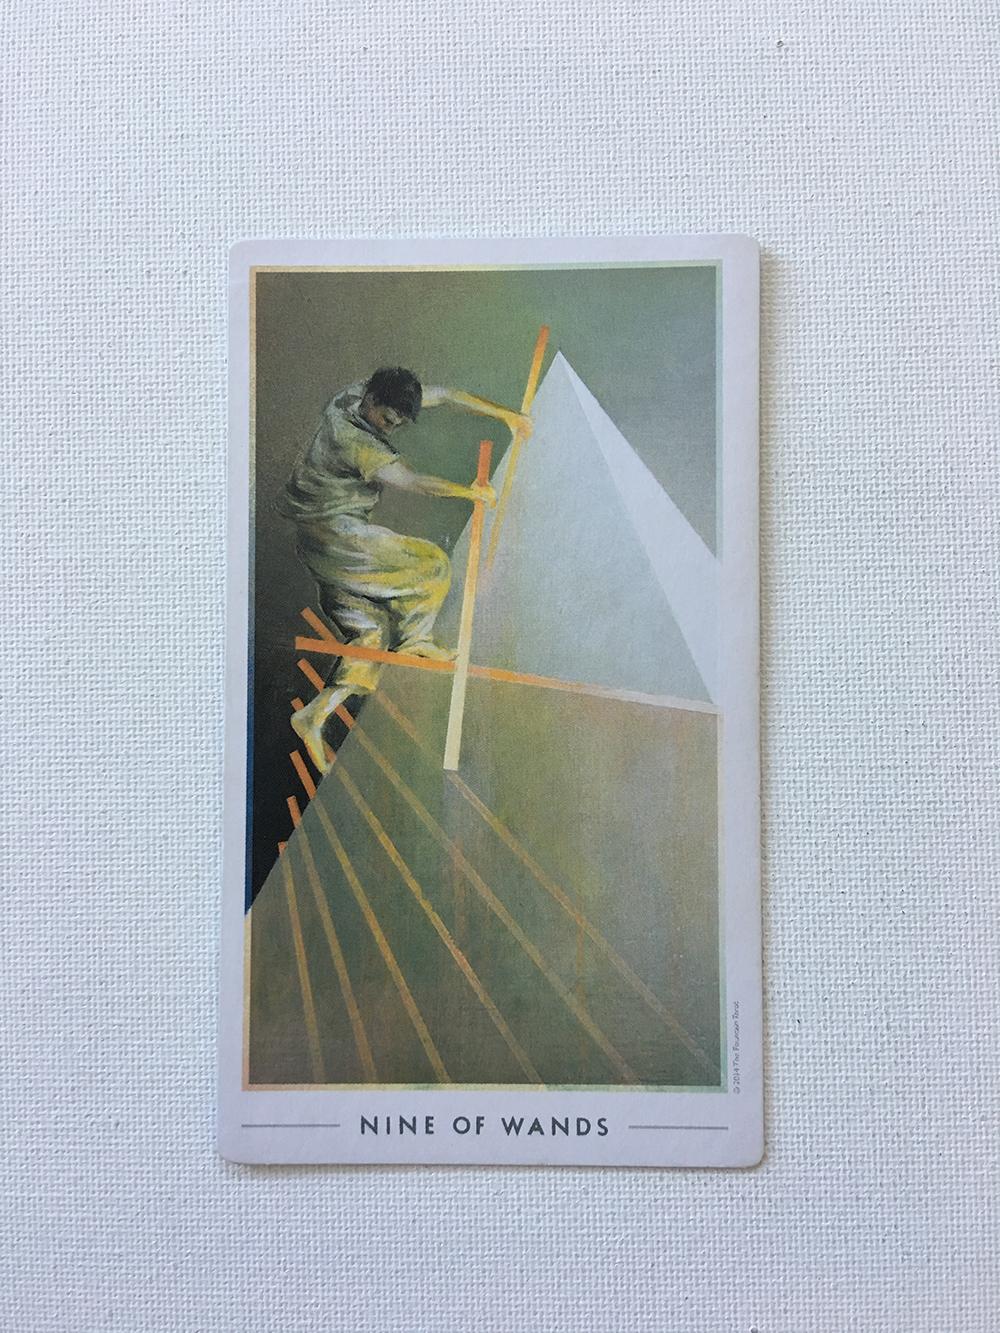 Nine of Wands.